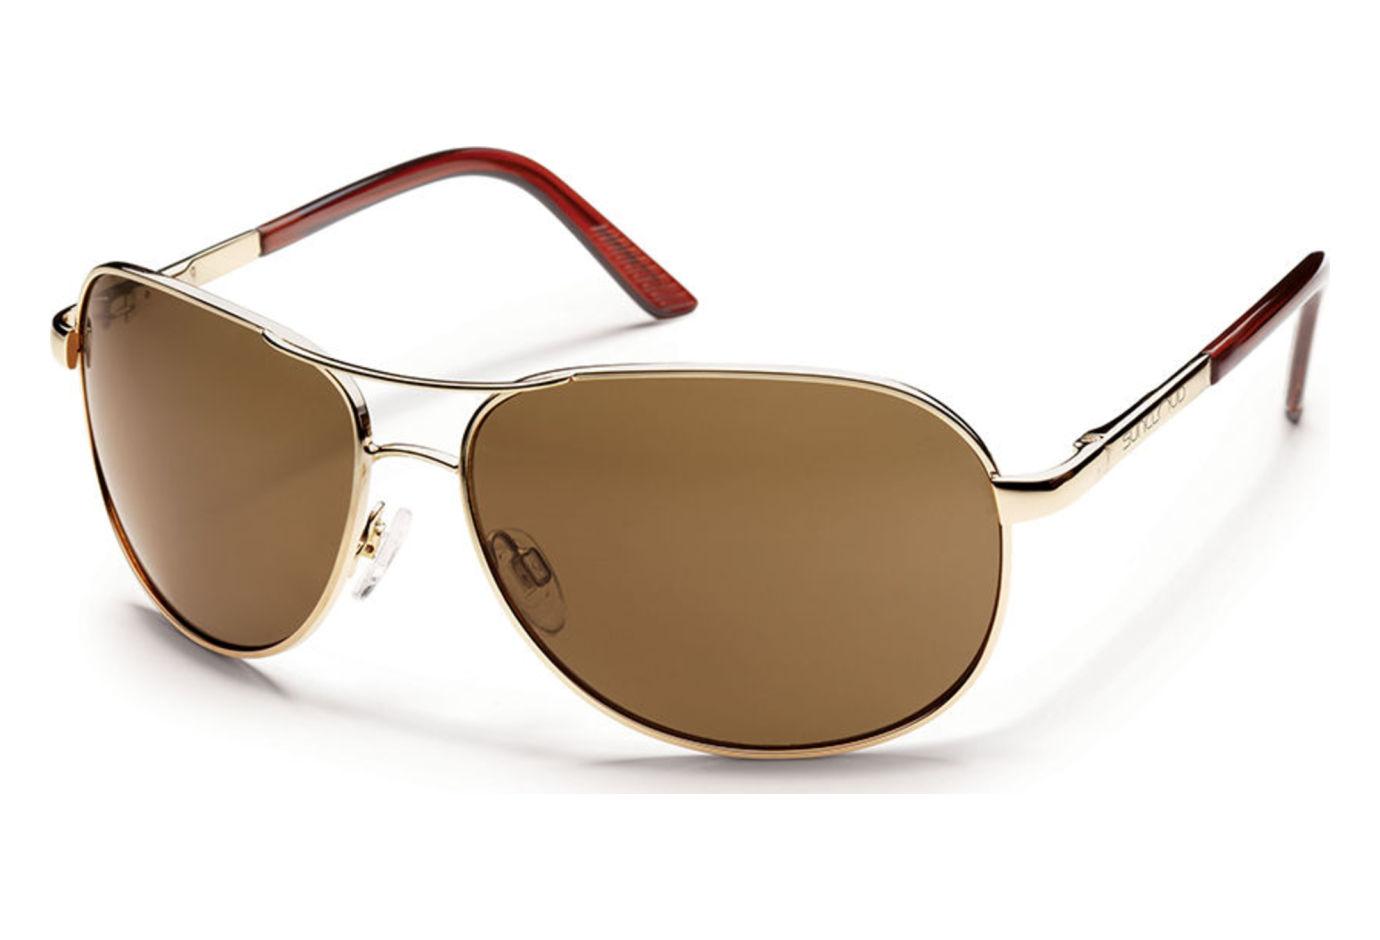 Gold Frame Aviator Sunglasses : Suncloud Aviator Sunglasses Gold Frames, Brown Lens